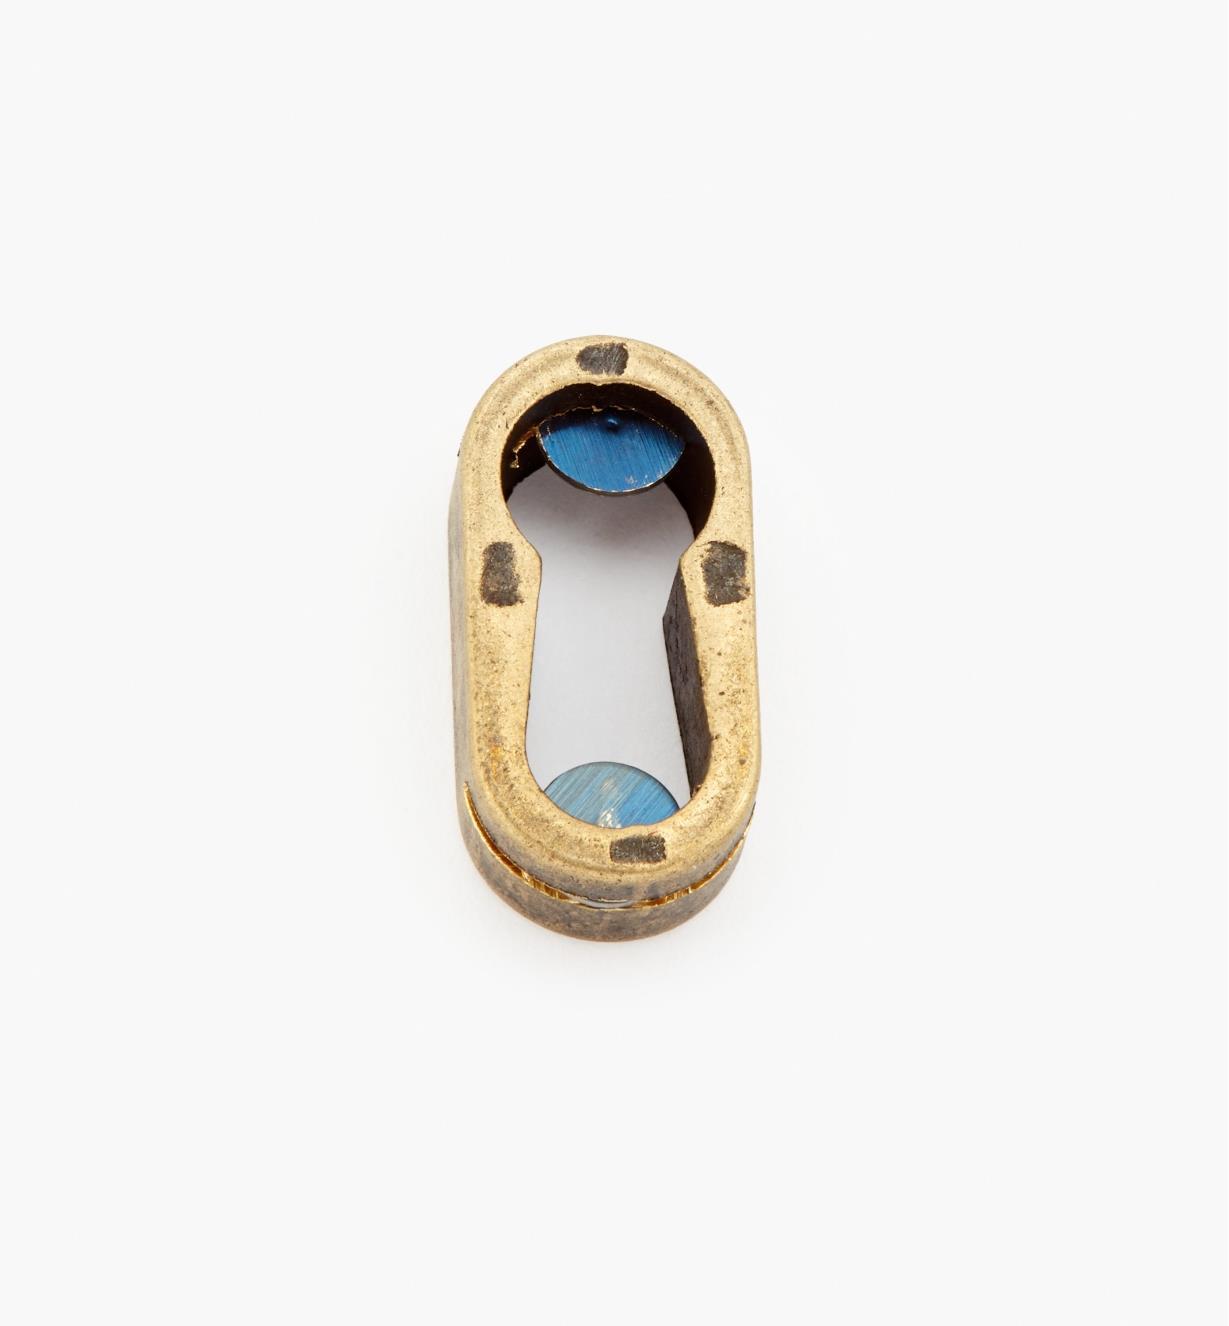 01A4809 - Ant. Brass Flush Esc.